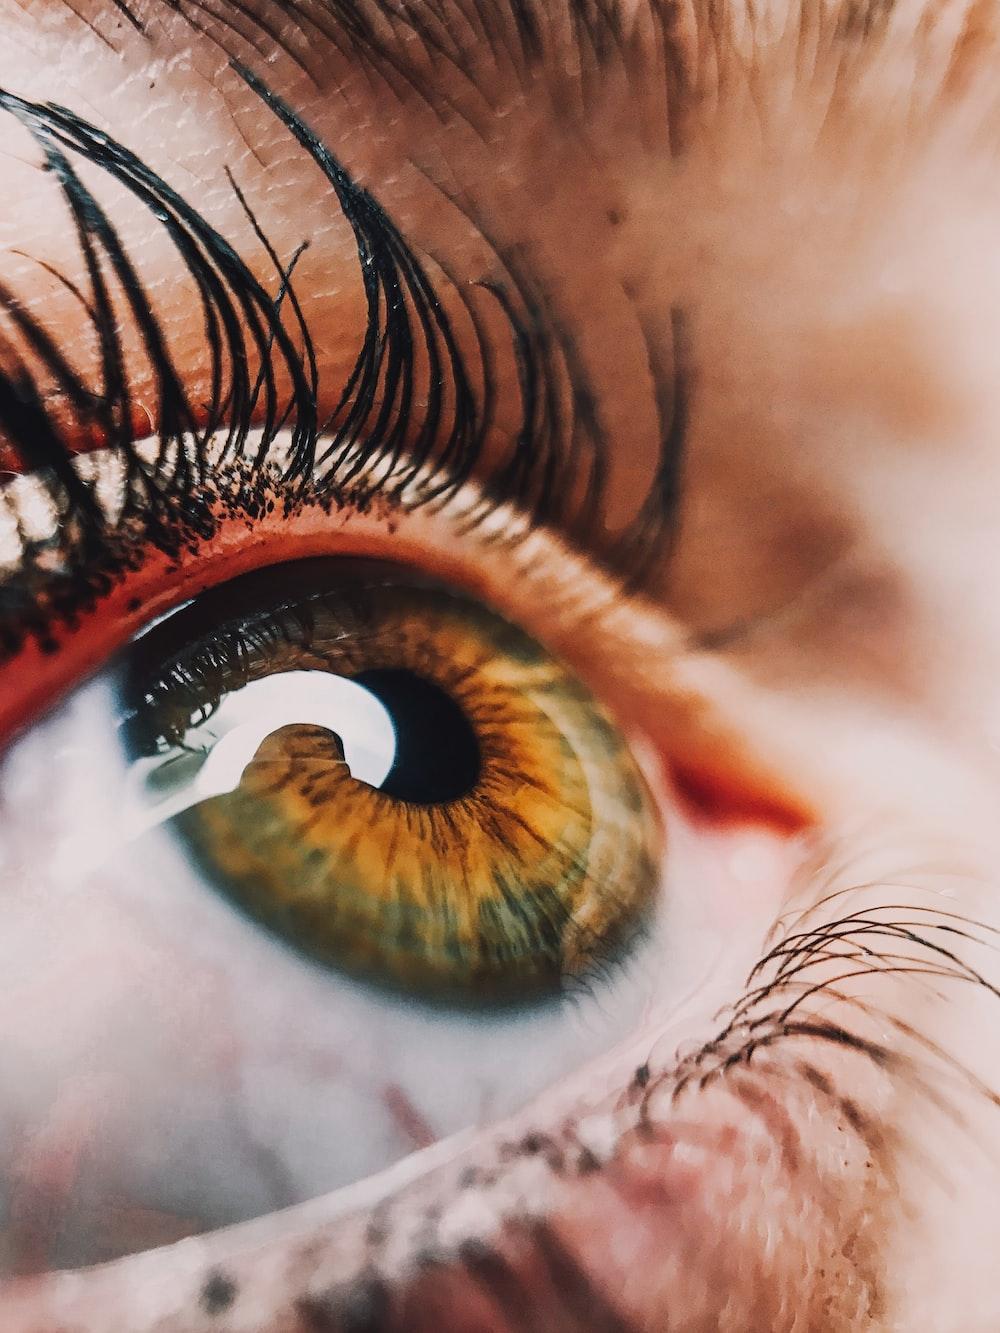 human eye close-up photography